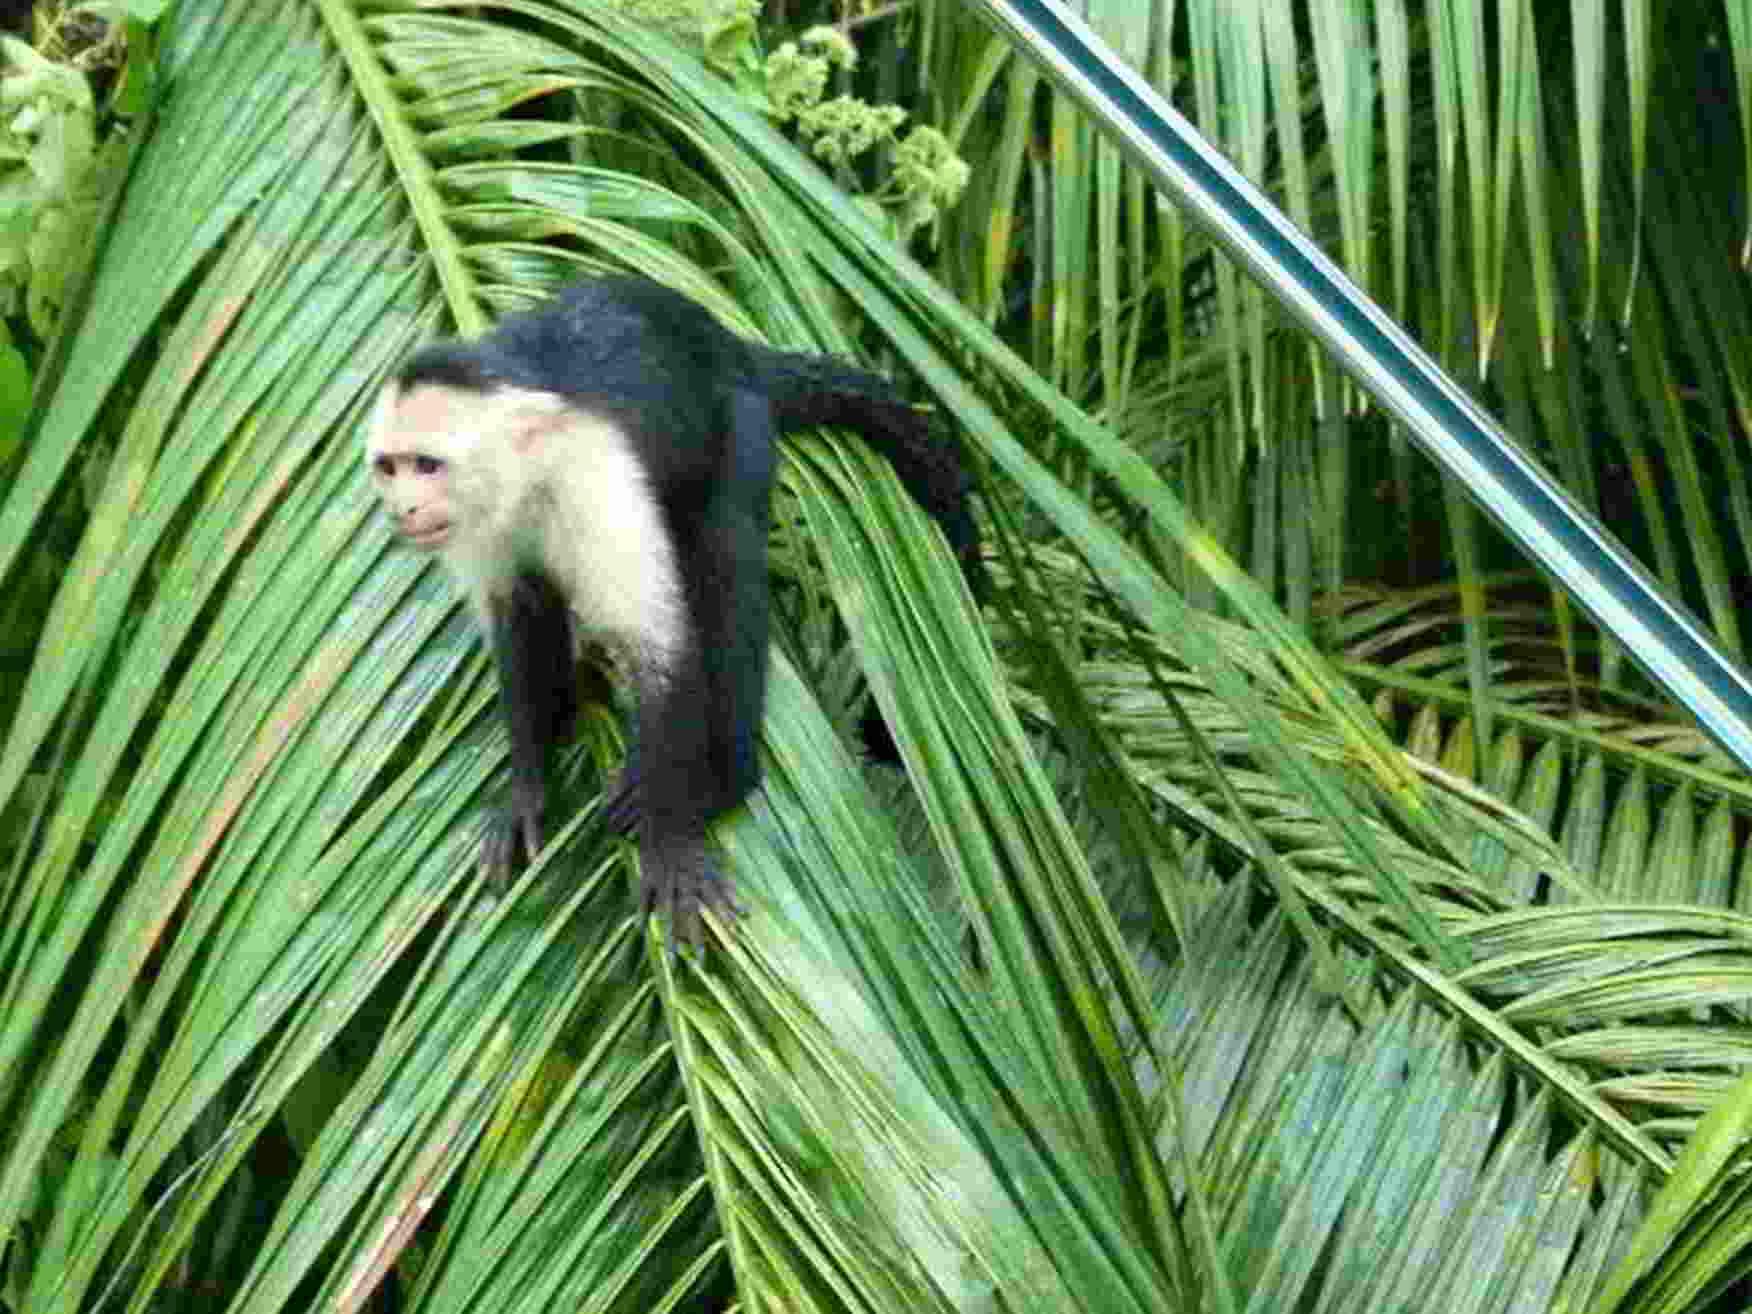 kokopelli-sierpe-kokopelli-sierpe-restaurant-tours-mangrove-corcovado-nature-sierpe-tour-monkey-3